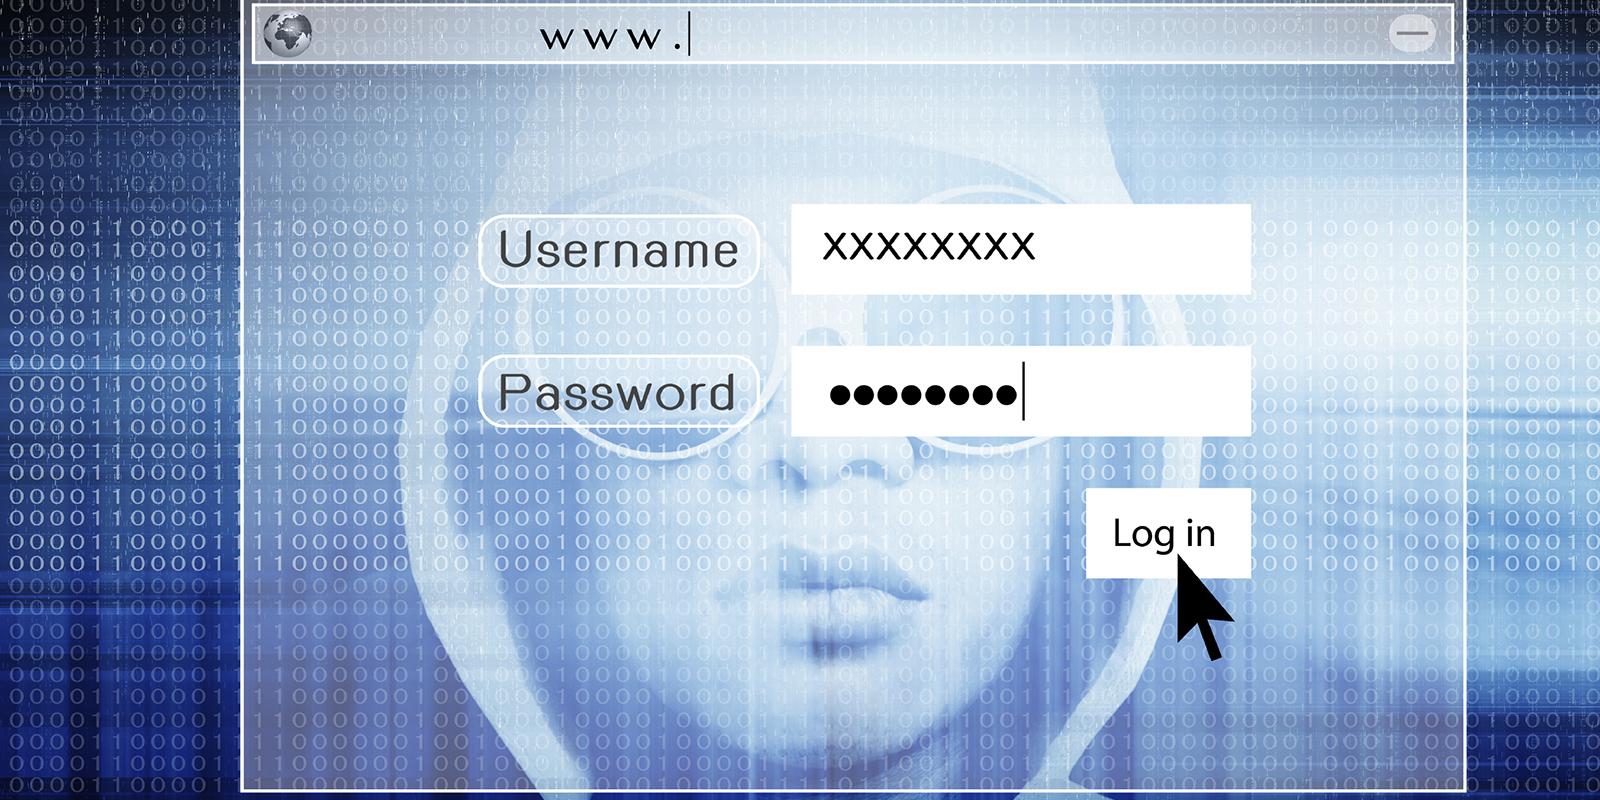 Hacker in front of multiple computer screens.